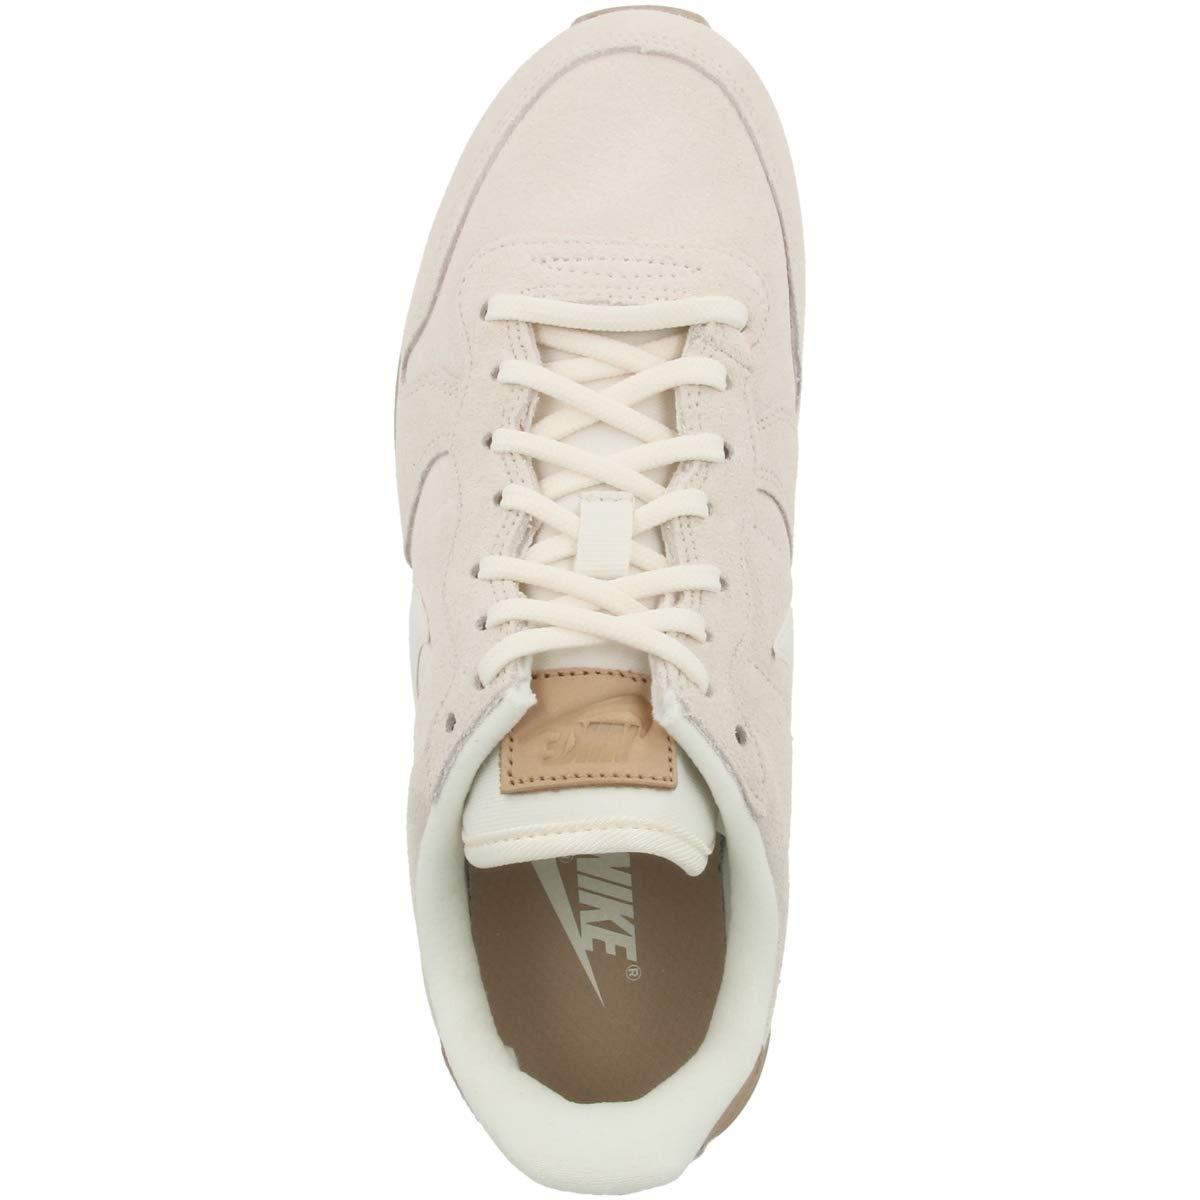 on sale 90b1f 149a6 Nike Damen W Internationalist PRM Laufschuhe Amazon.de Schuhe   Handtaschen